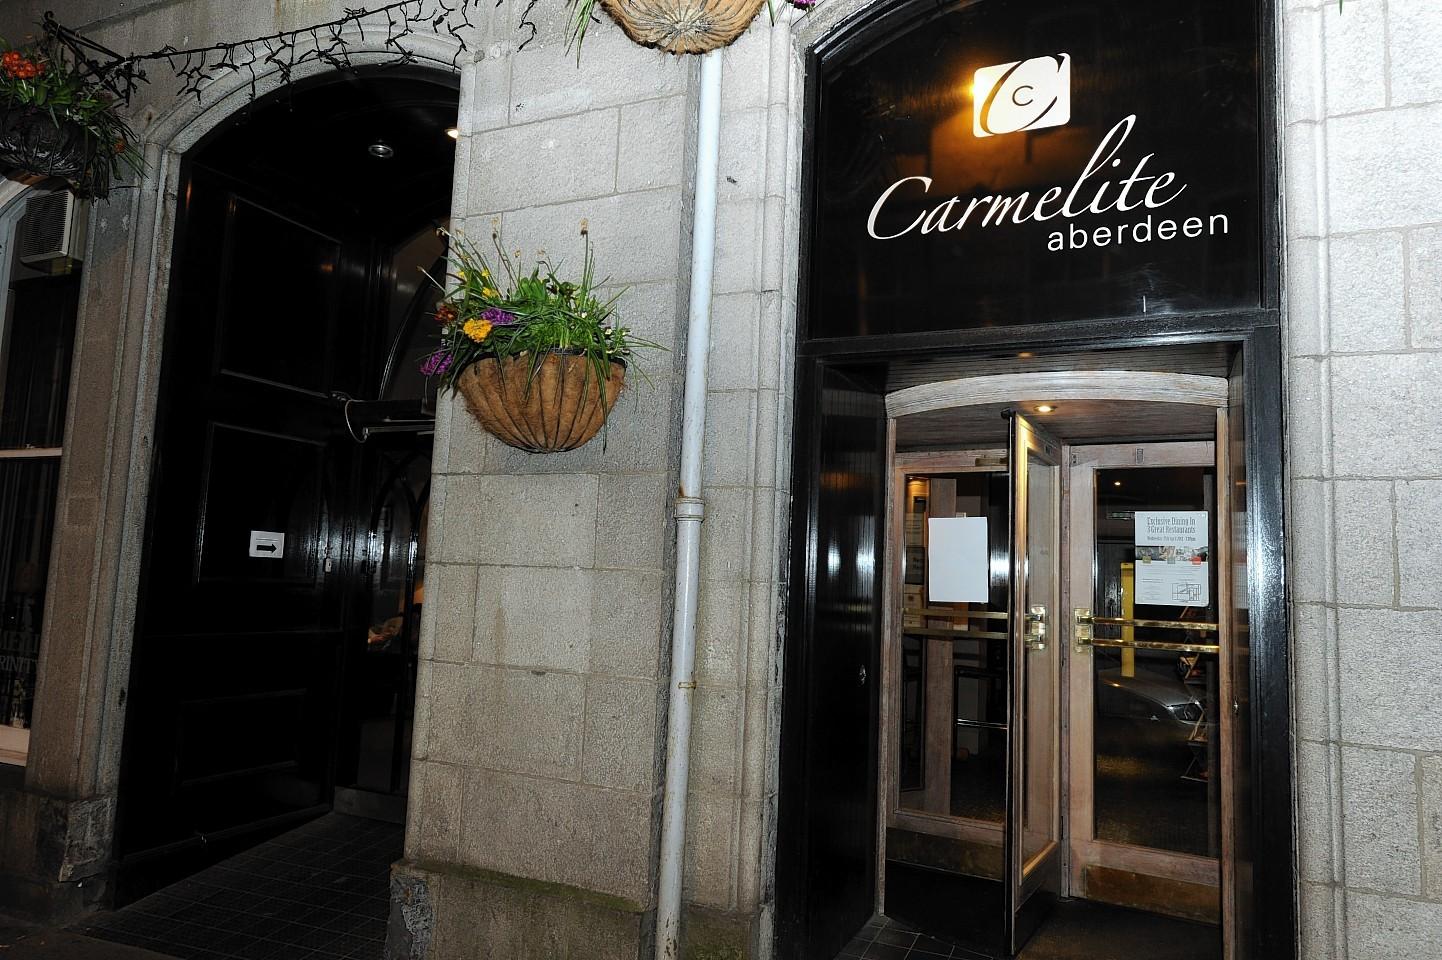 The Carmelite in Aberdeen